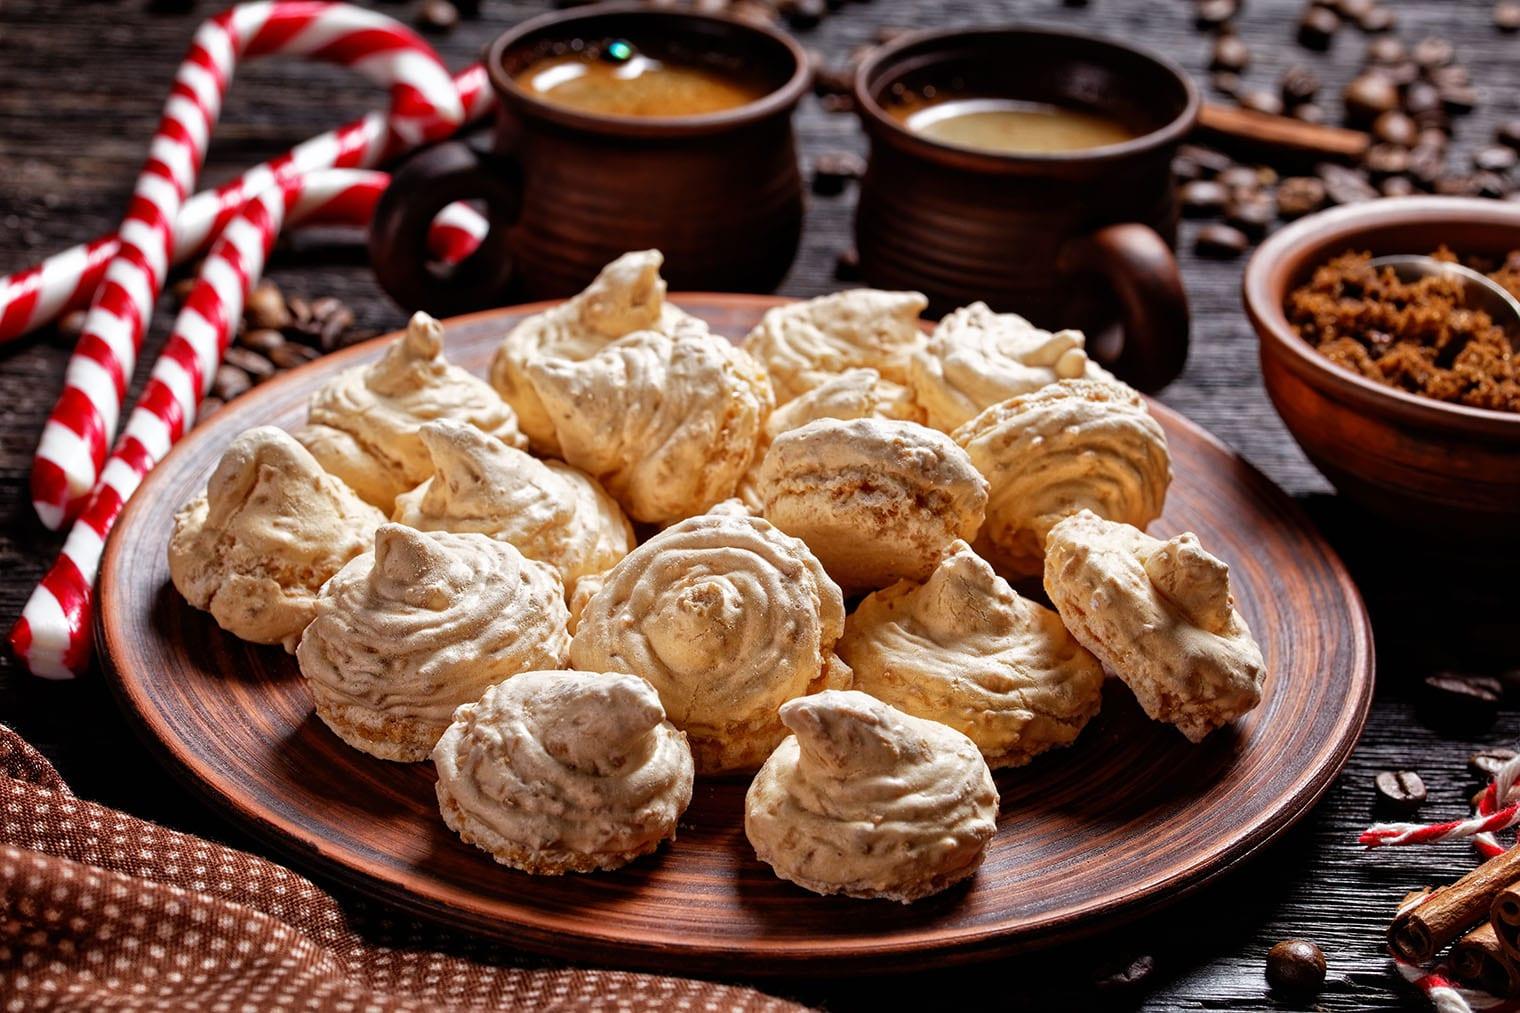 Keto Pumpkin Cookies (Pumpkin Spice Meringue Cookies)